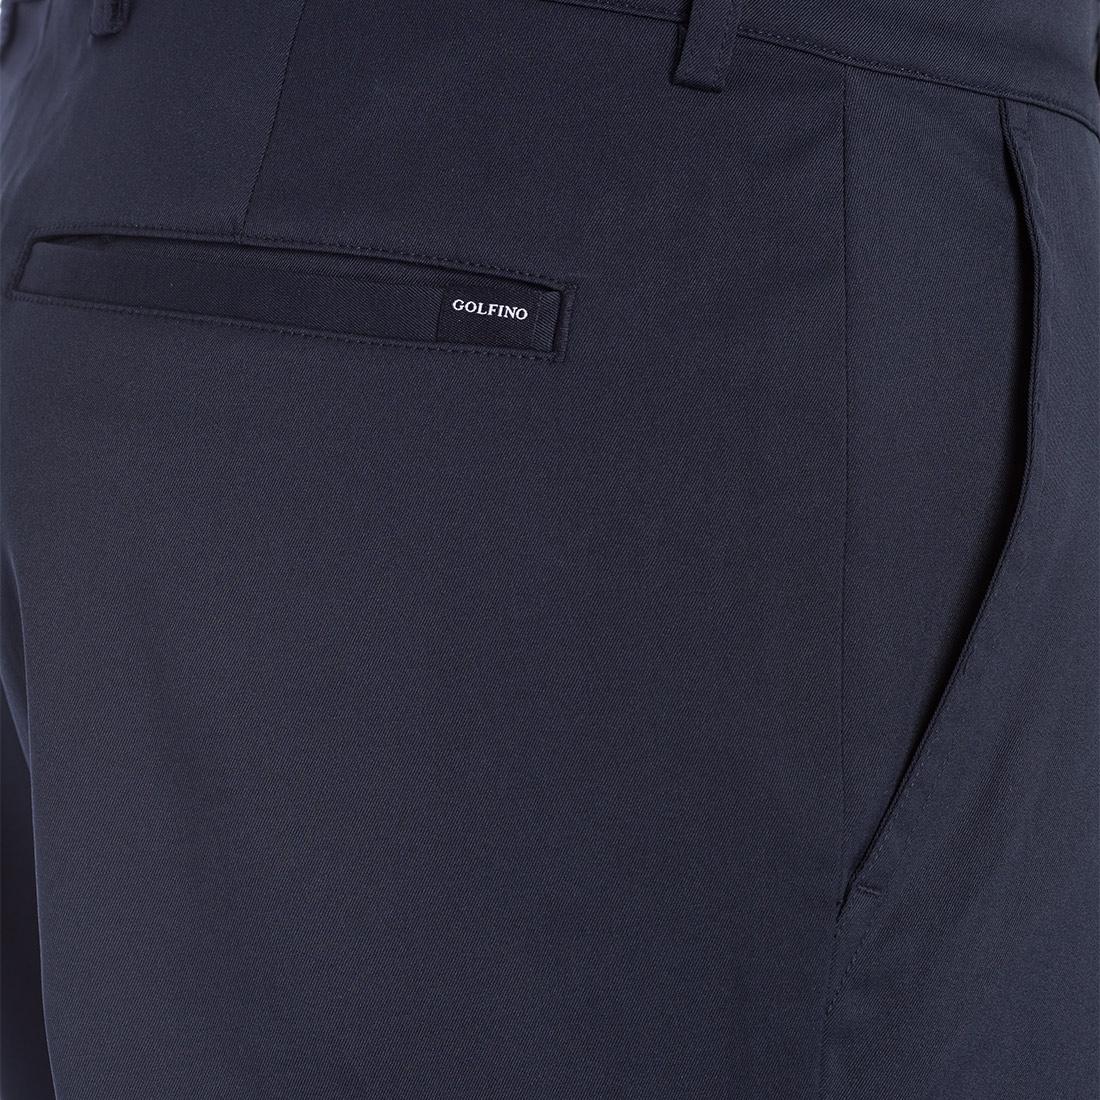 Herren Golfhose aus schnelltrocknendem Material